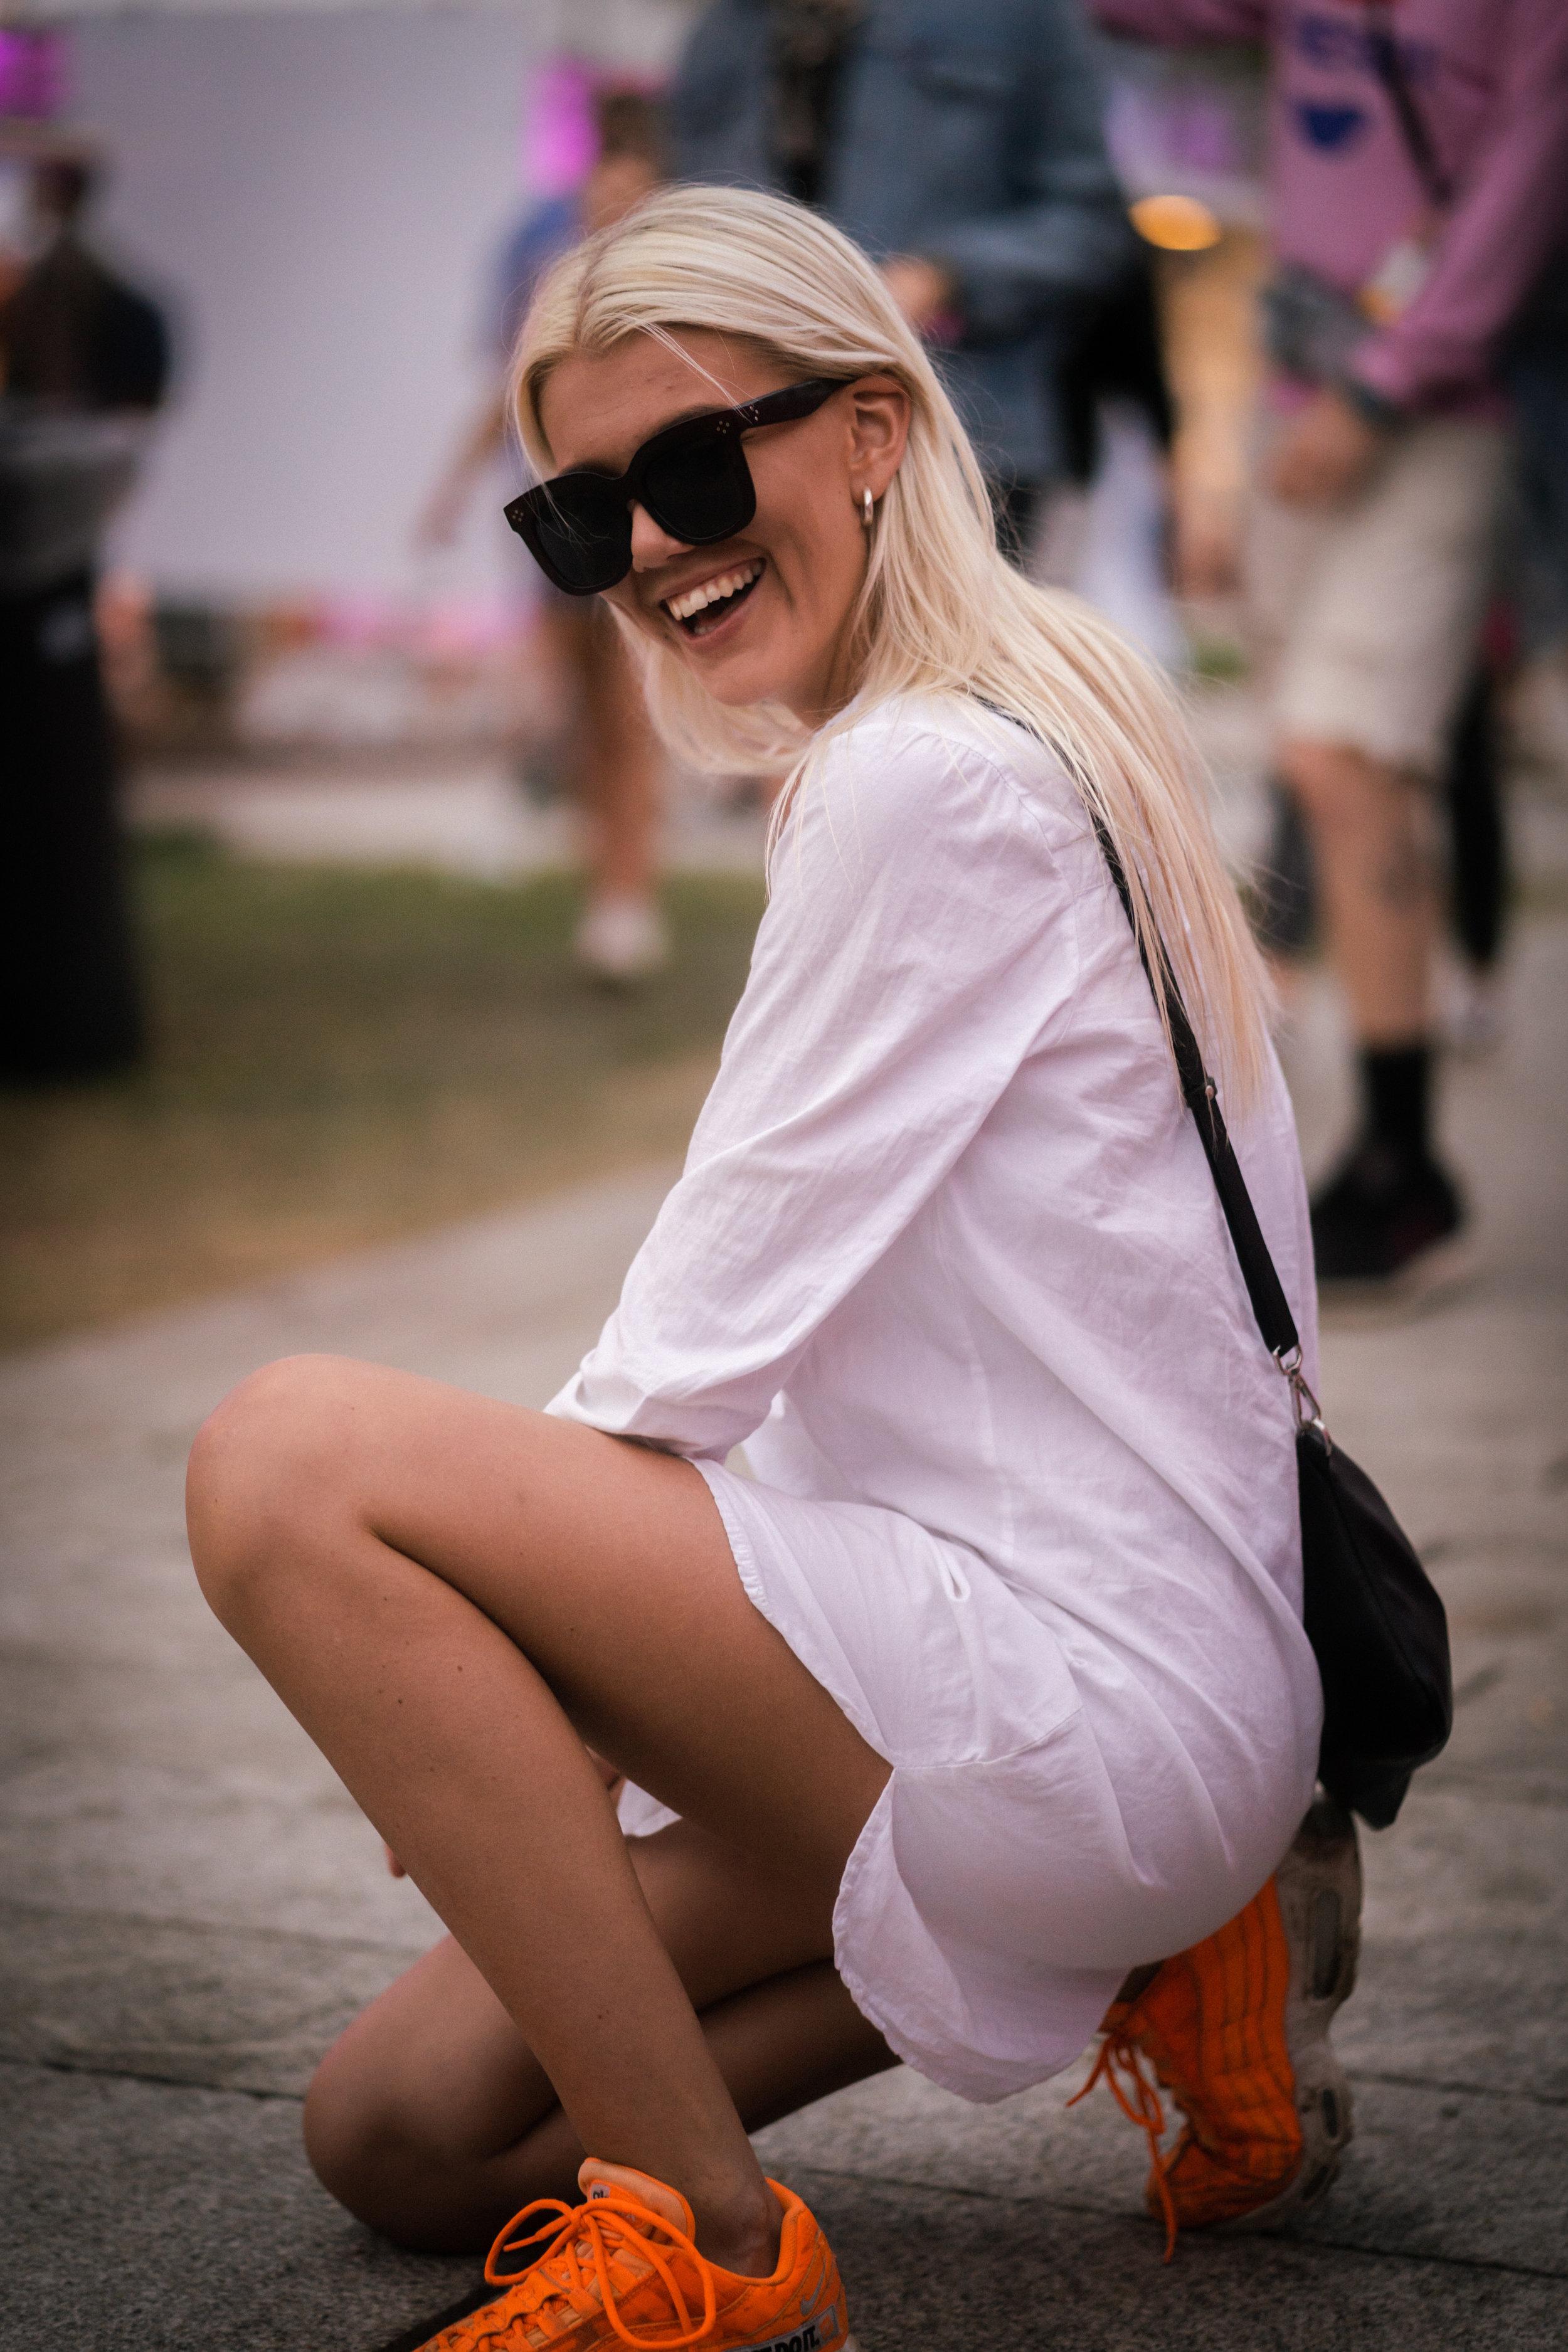 Emma Ringøen    in neon sneakers from Nike and dress from Asos! Photo: Sander Berhus / Estér Magazine.